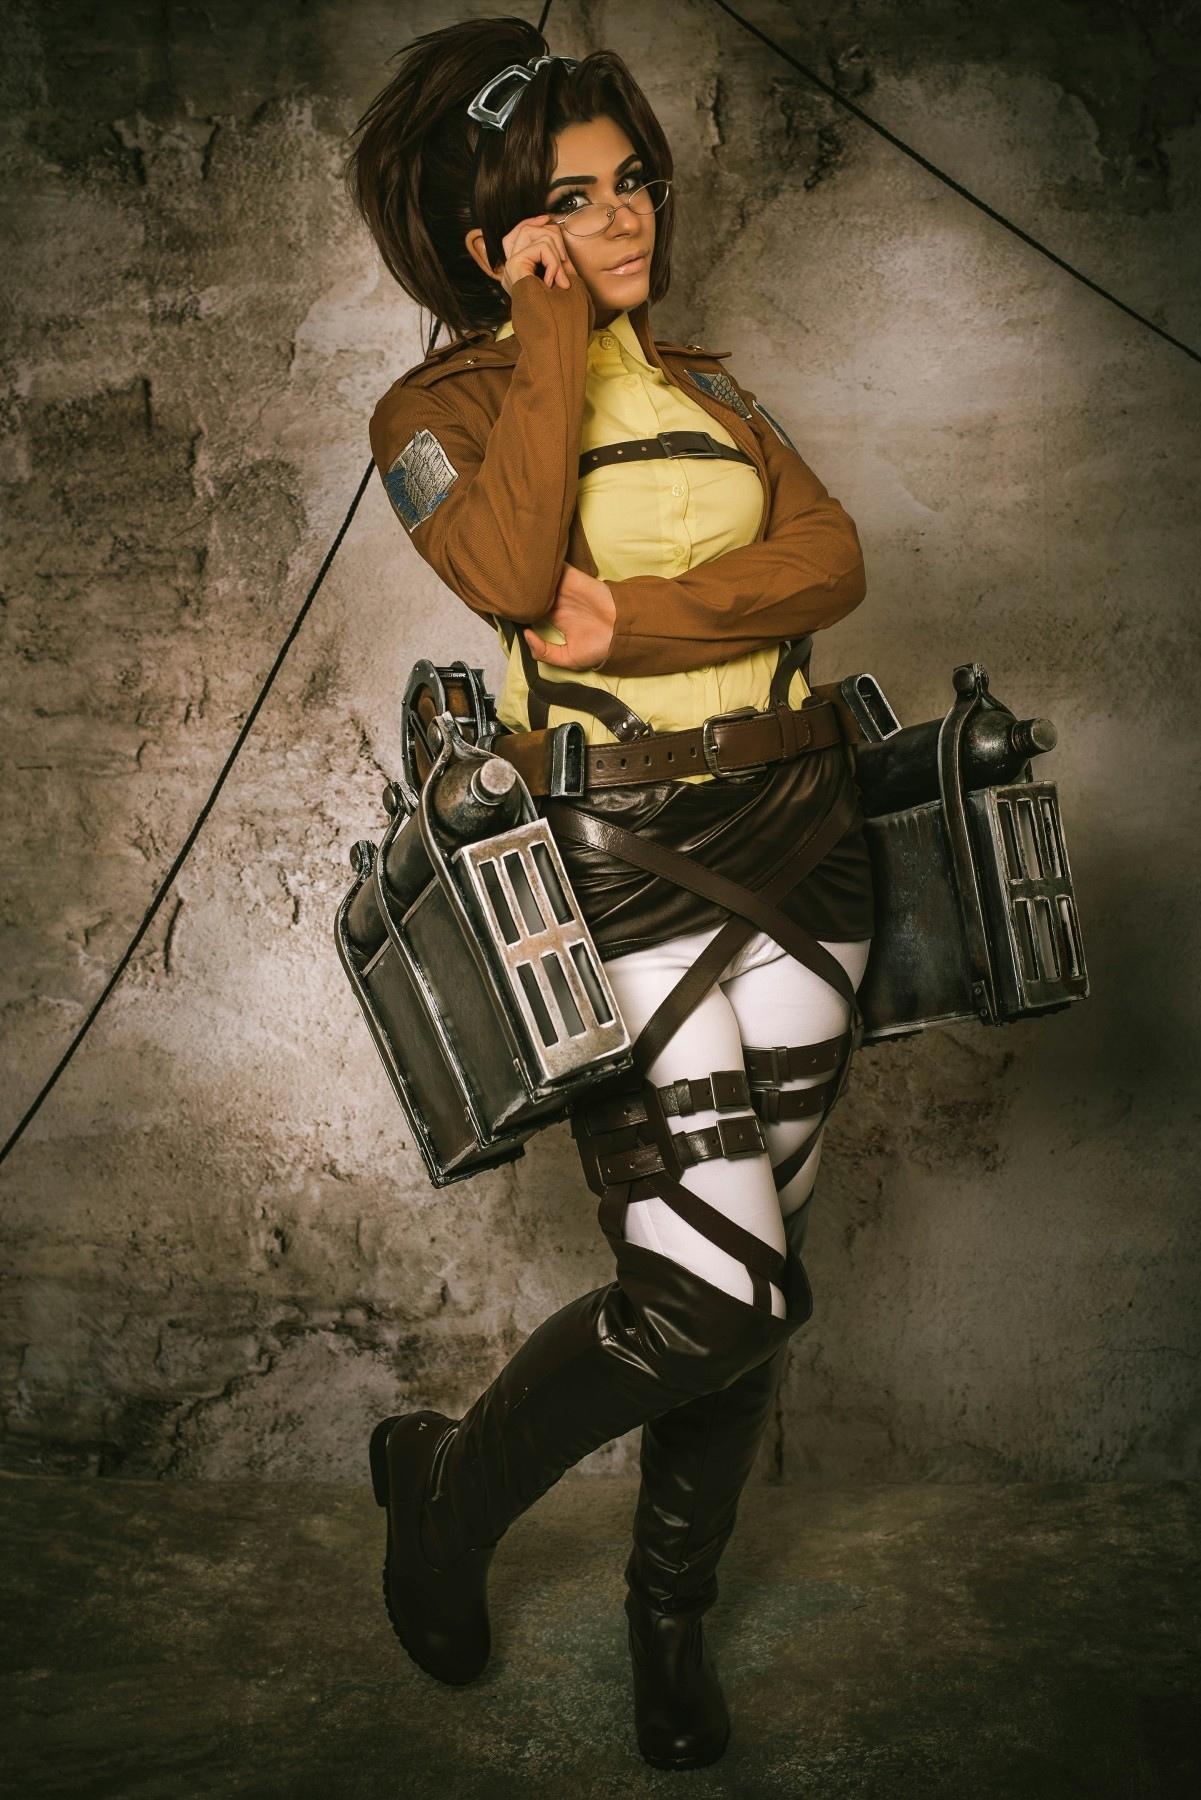 - Hange Zoe (Attack on Titan)